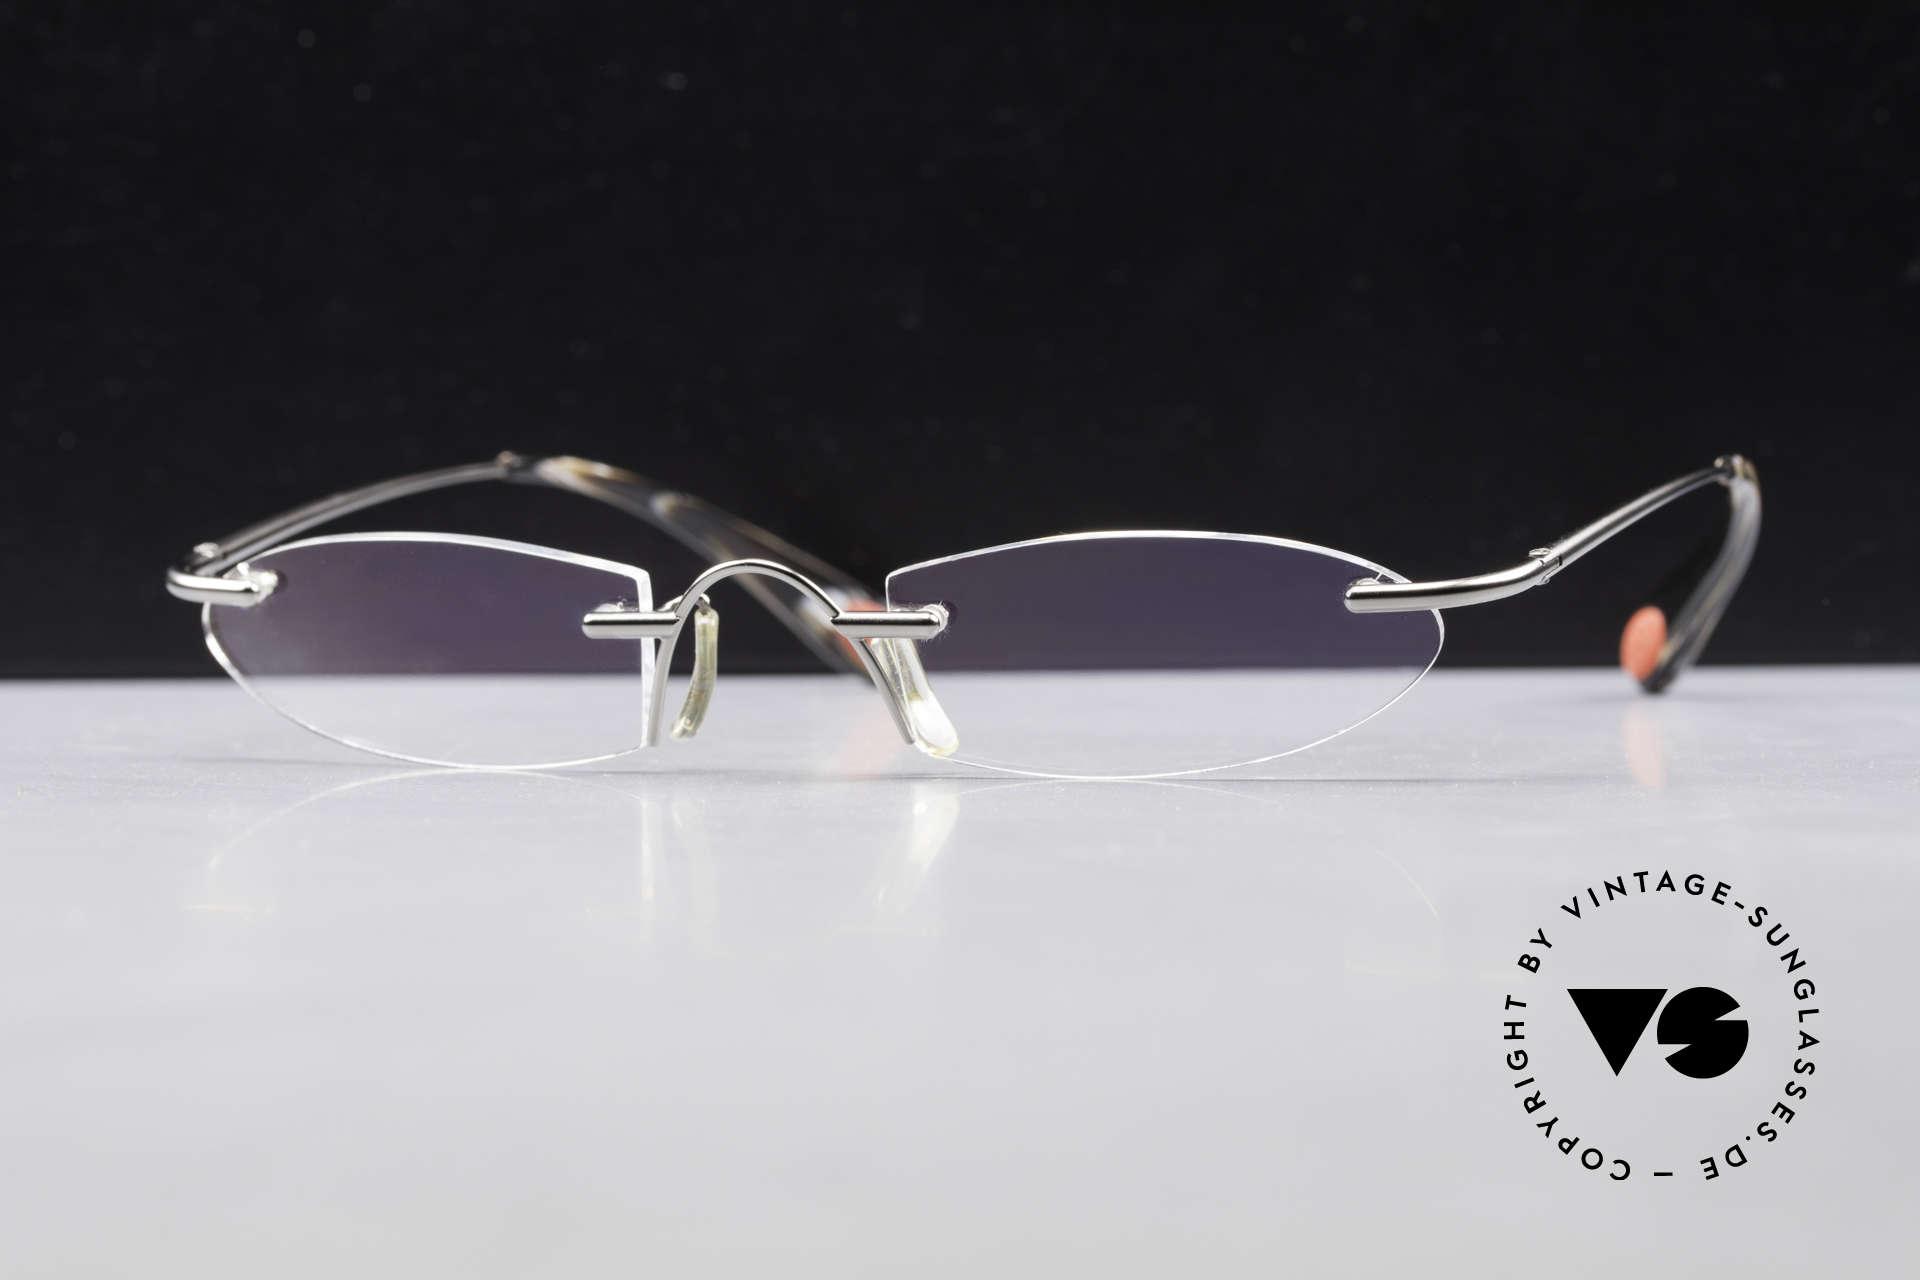 Bugatti 355 Odotype Rimless Designer Frame Men, original BUGATTI high-tech eyeglass-frame, Made for Men